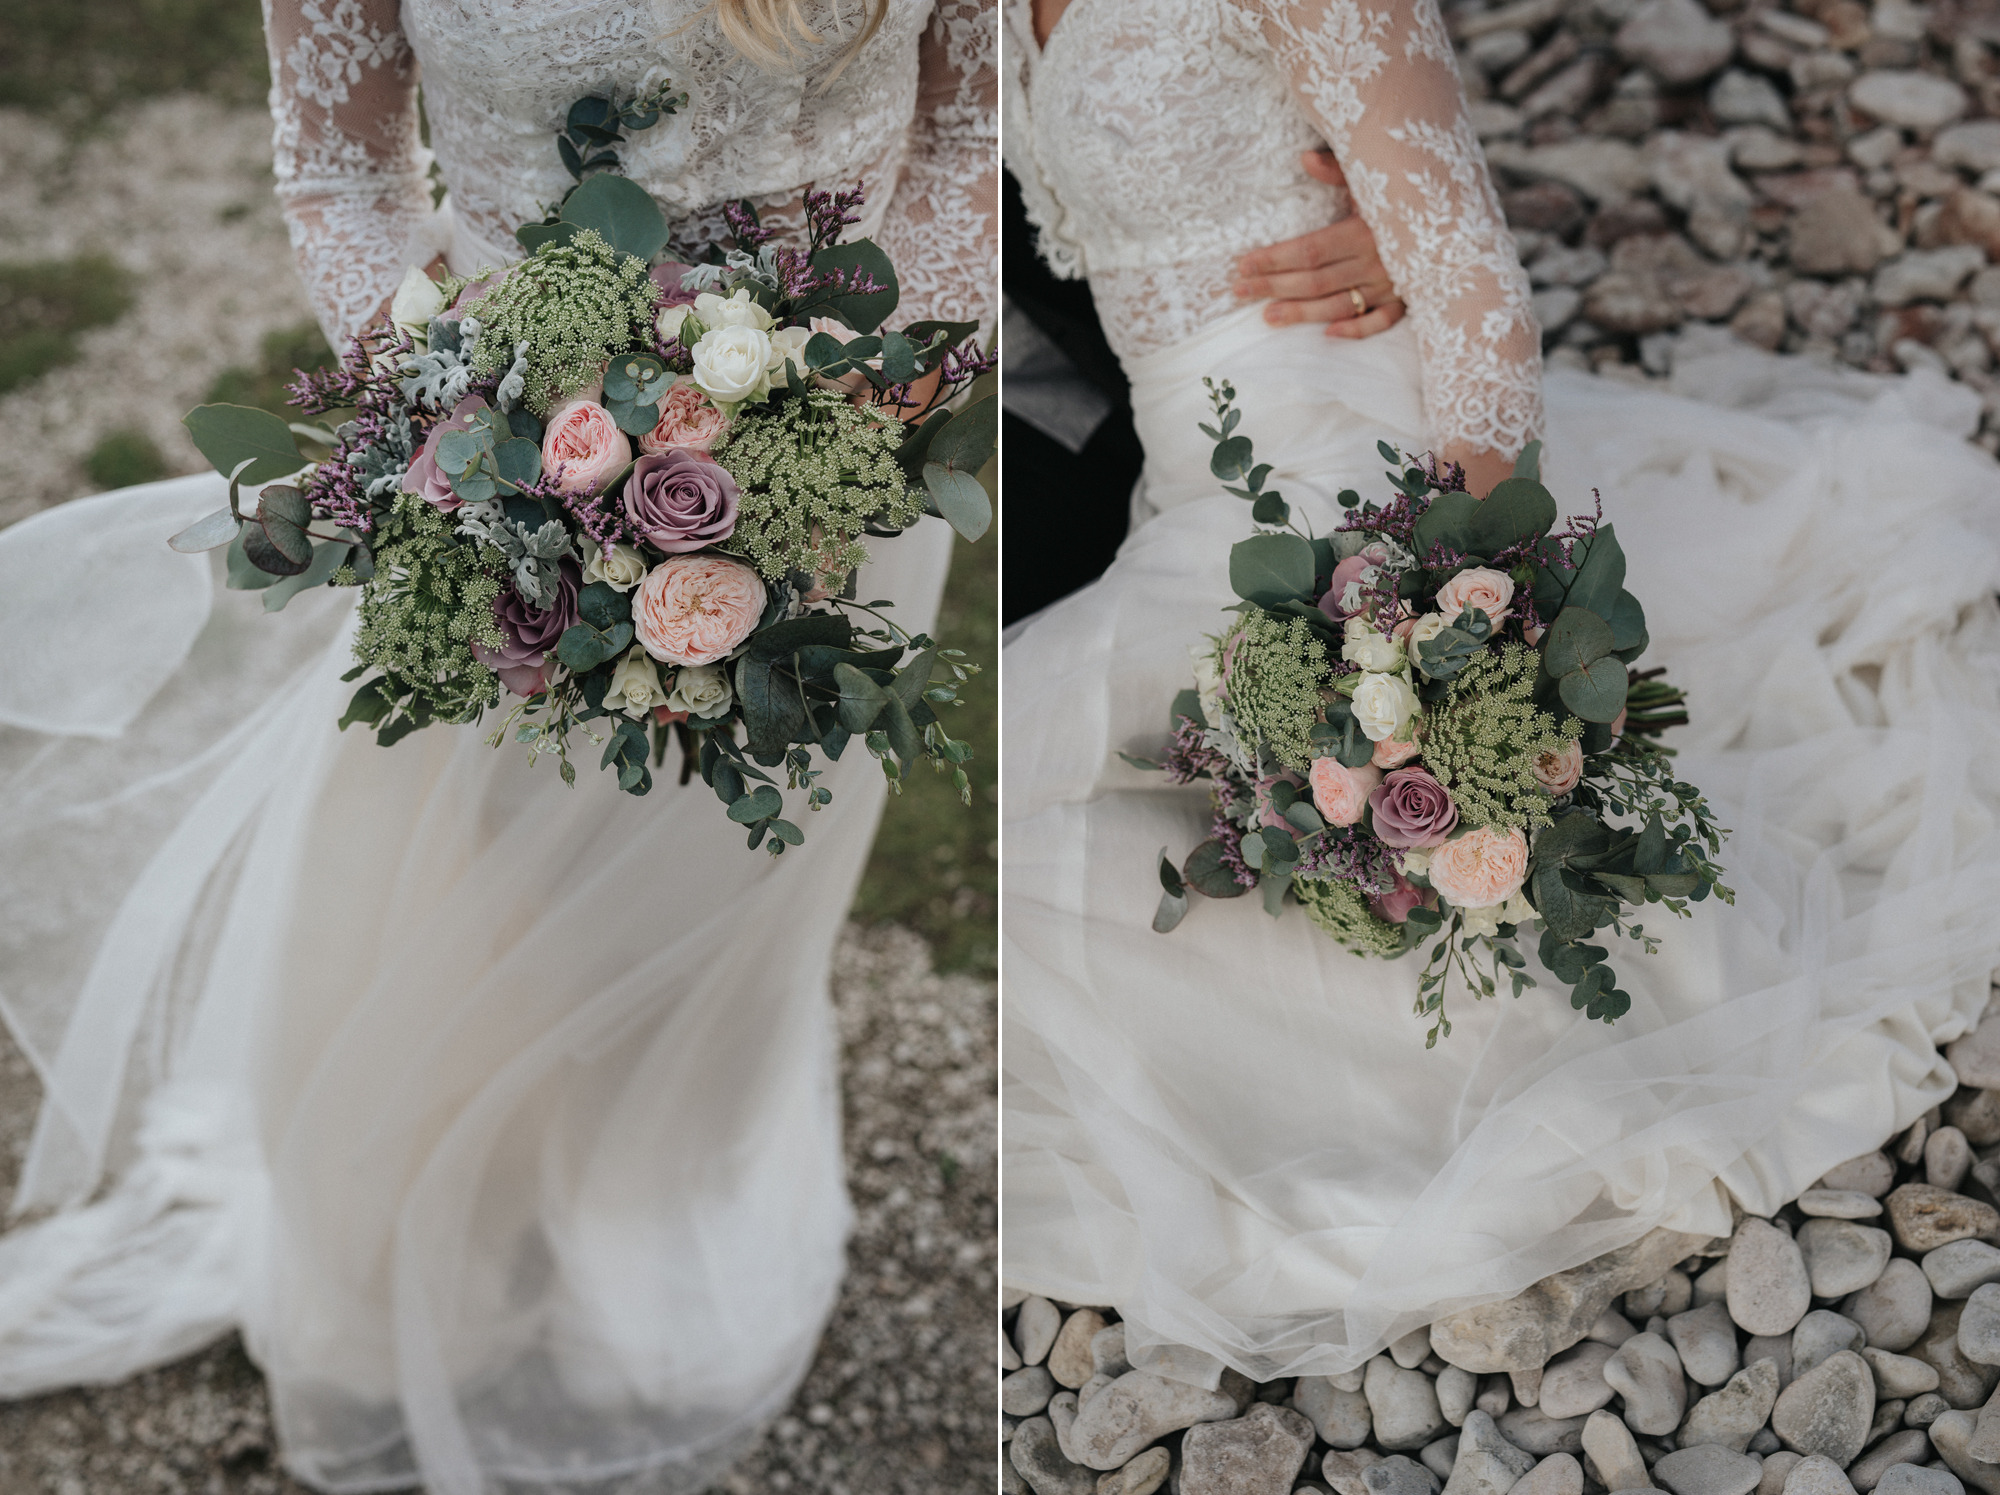 035-irisdals-blomsterhandel-brudbukett-neas-fotografi.jpg